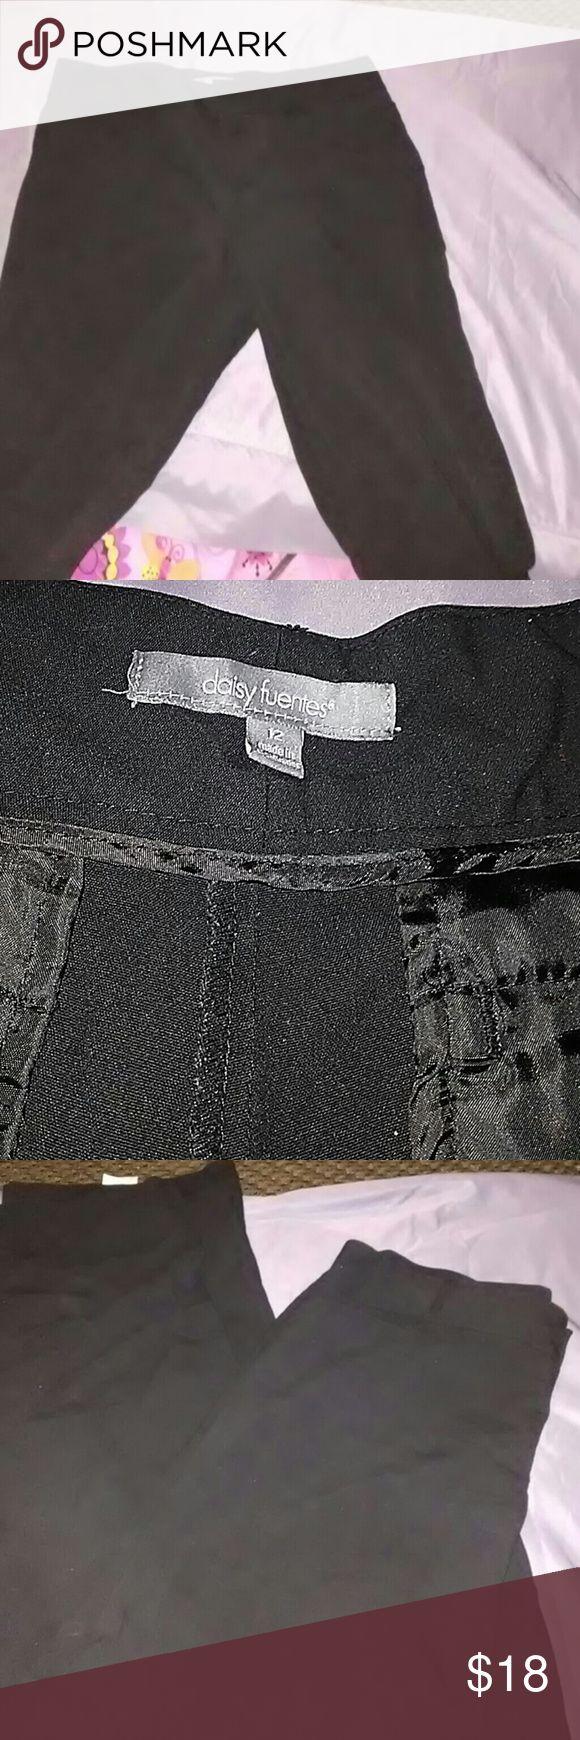 Daisy Fuentes pants Daisy Fuentes Dress  pants Daisy Fuentes Pants